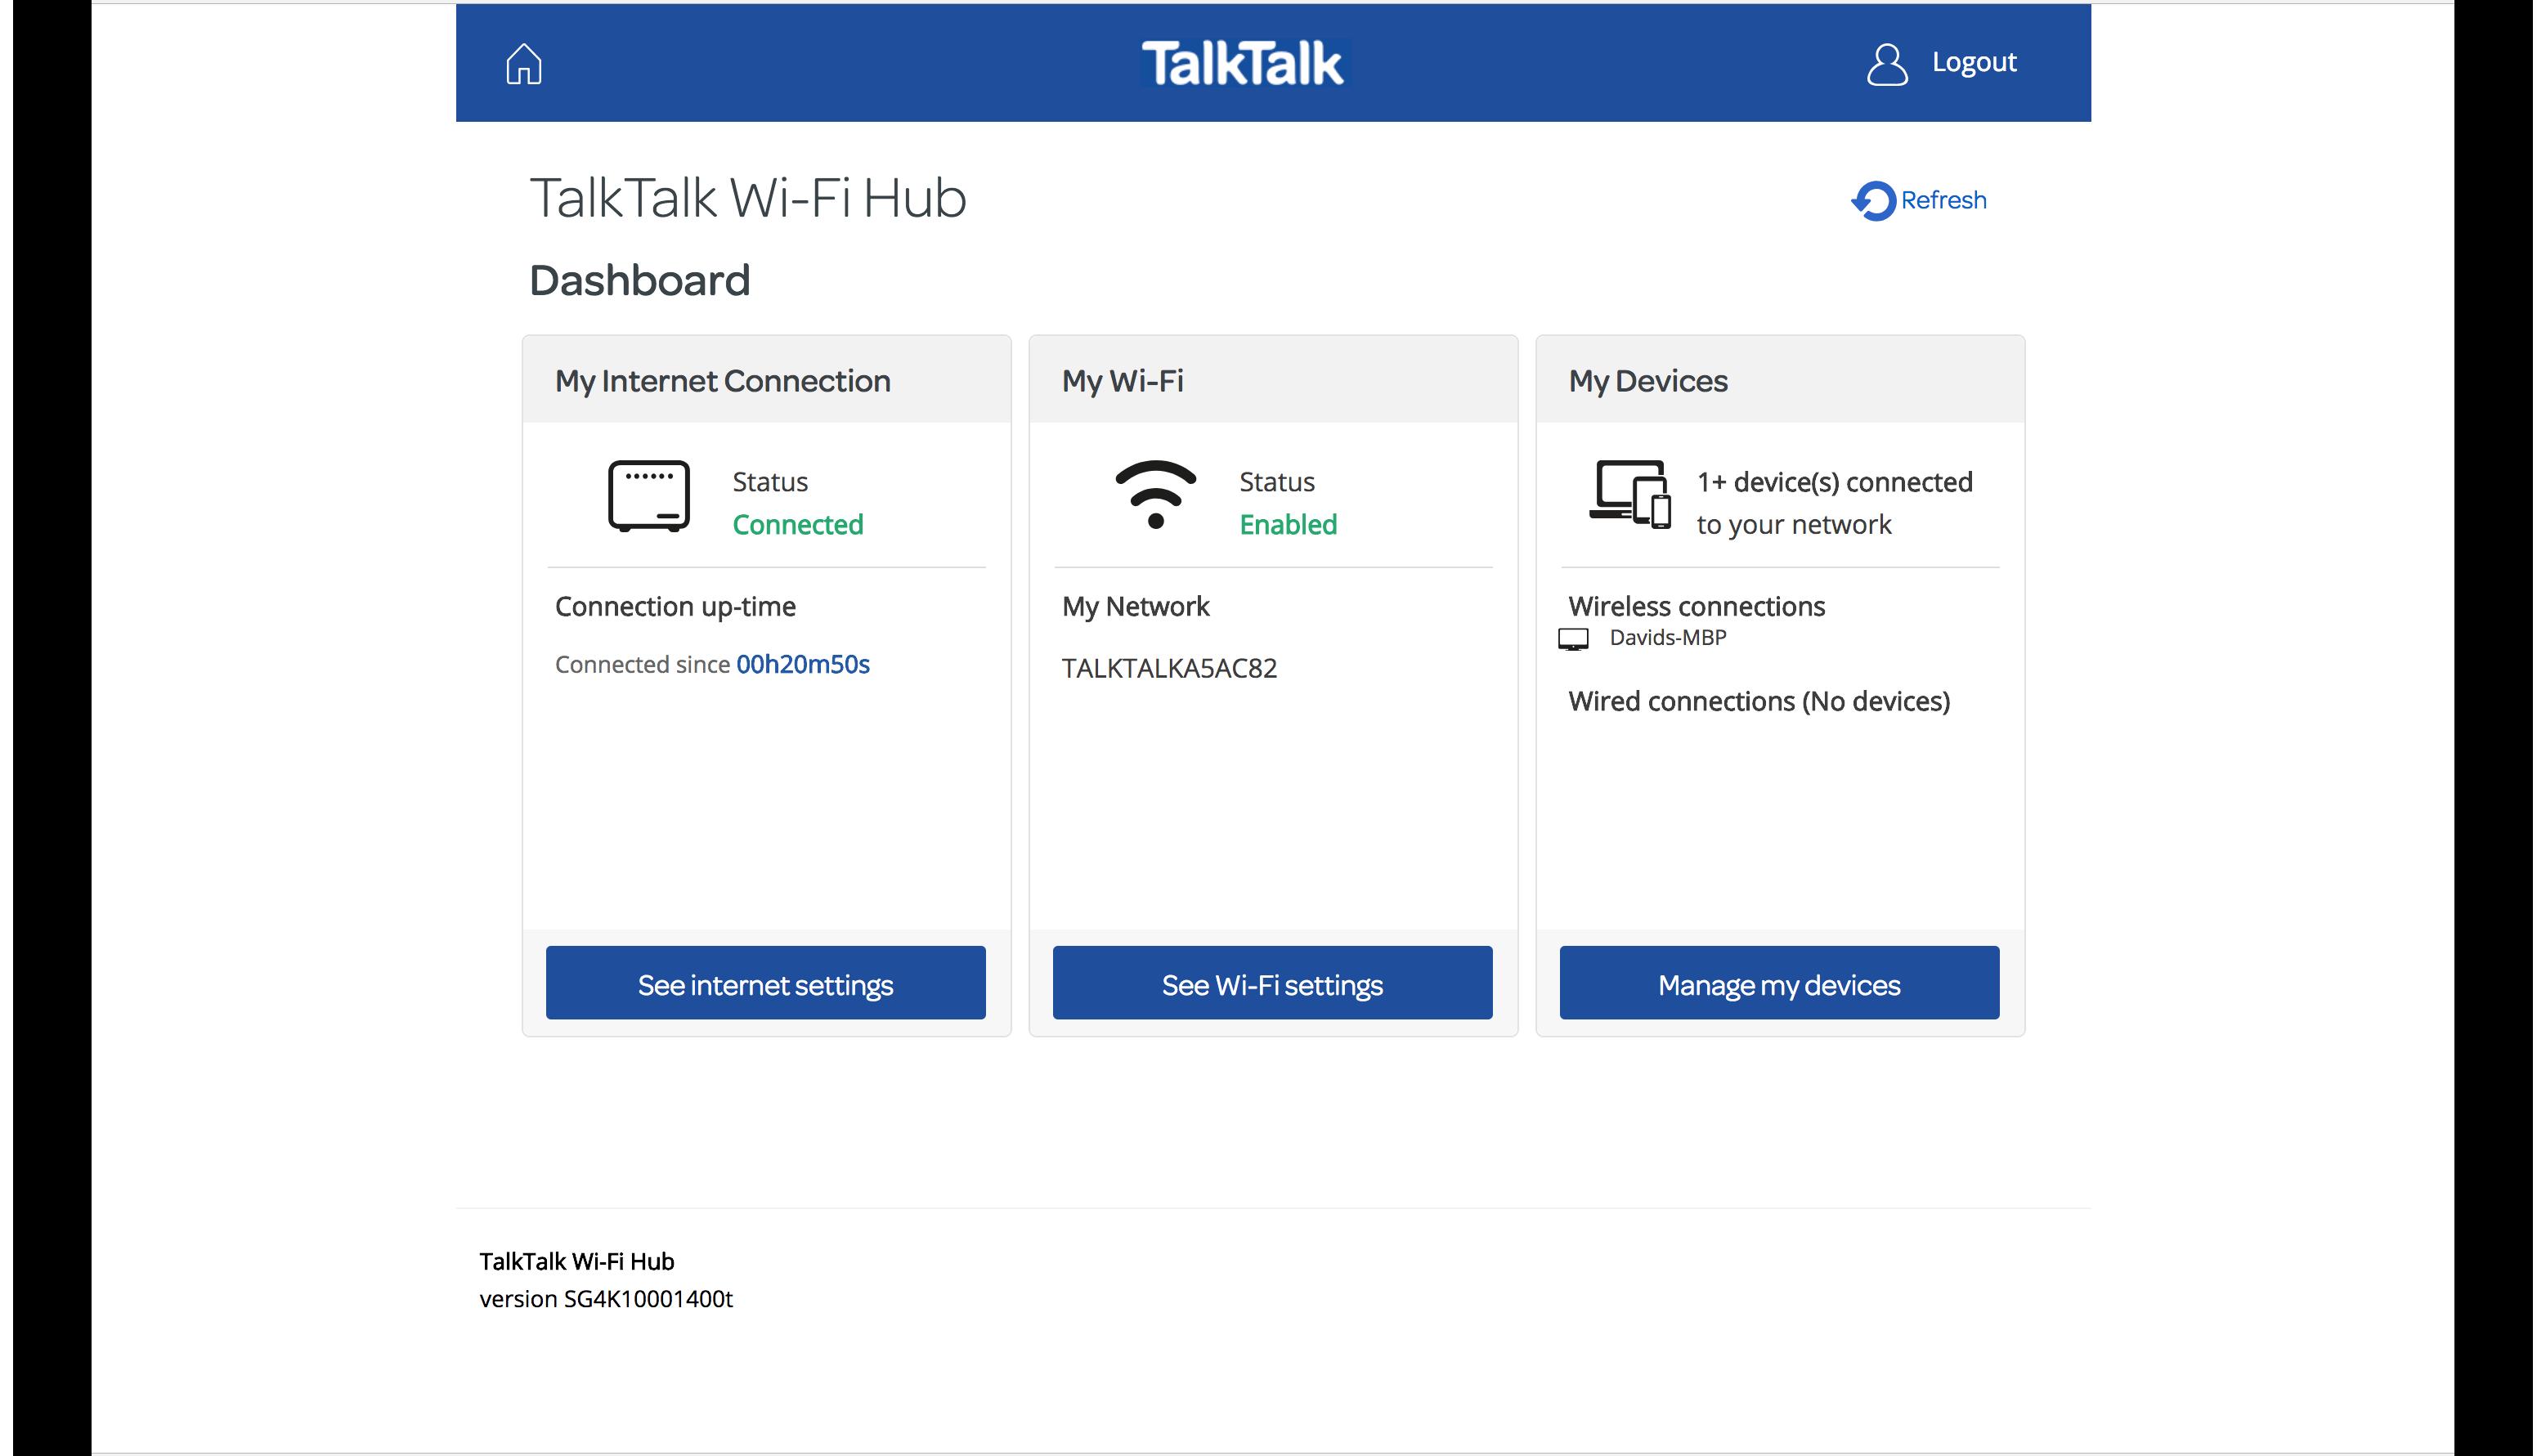 TalkTalk Wi-Fi Hub Review | Trusted Reviews